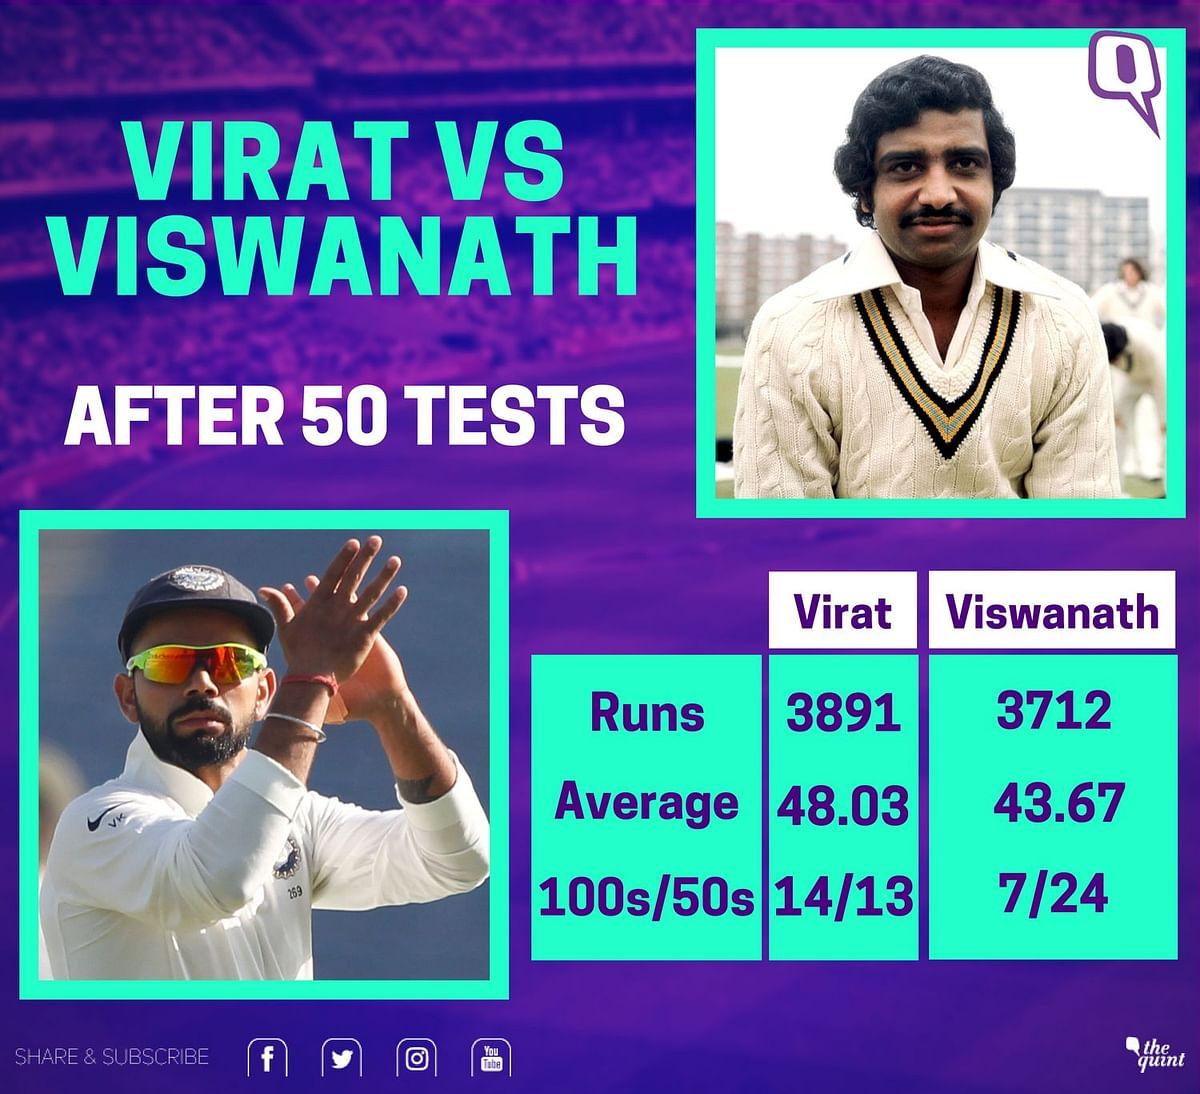 Gundappa Viswanath: Sunil Gavaskar's Favourite Cricketer